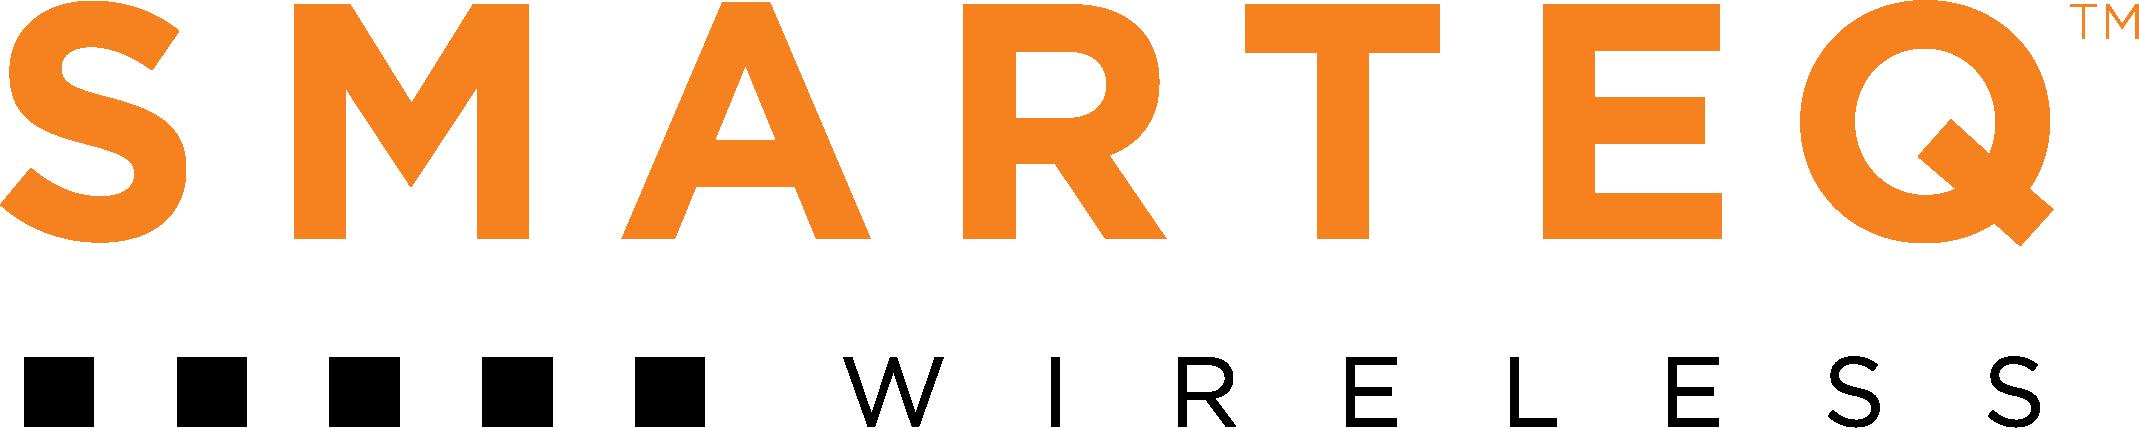 Smarteq Wireless AB